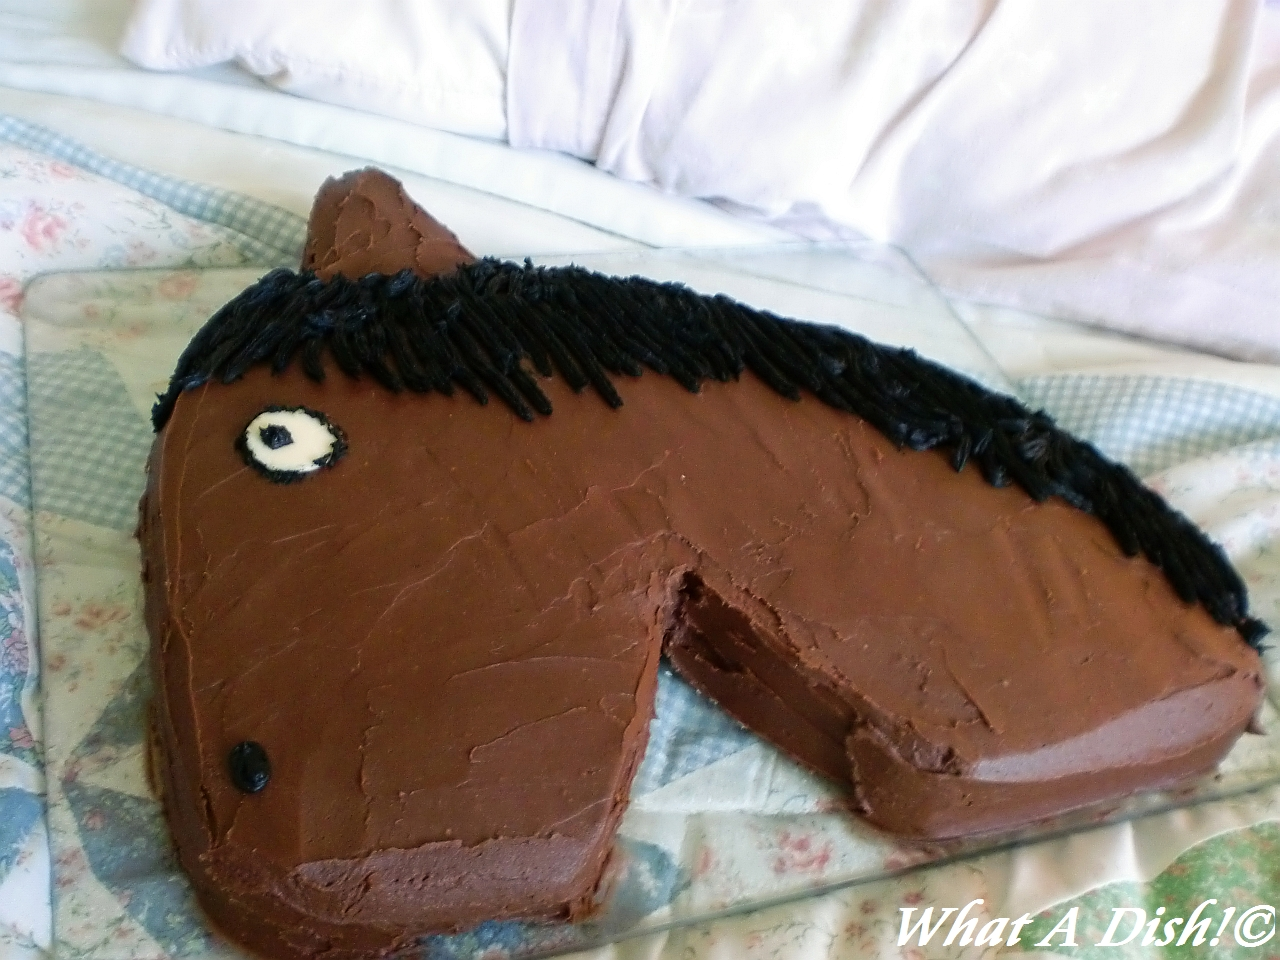 What A Dish!: Horse Birthday Cake!